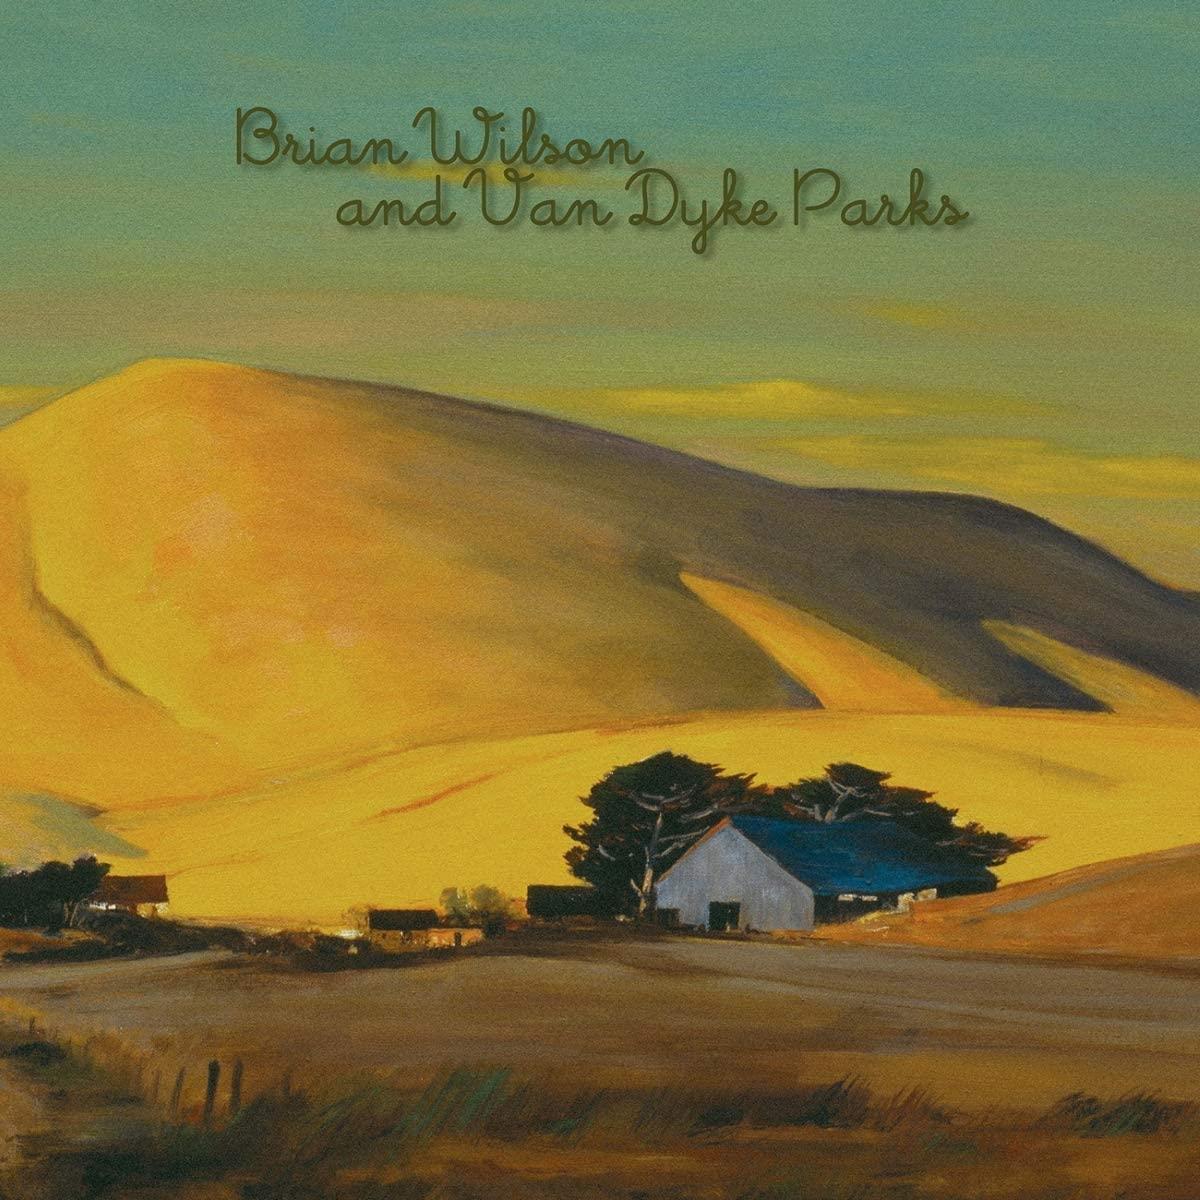 Brian Wilson and Van Dyke Park - Orange Crate Art [2xLP]